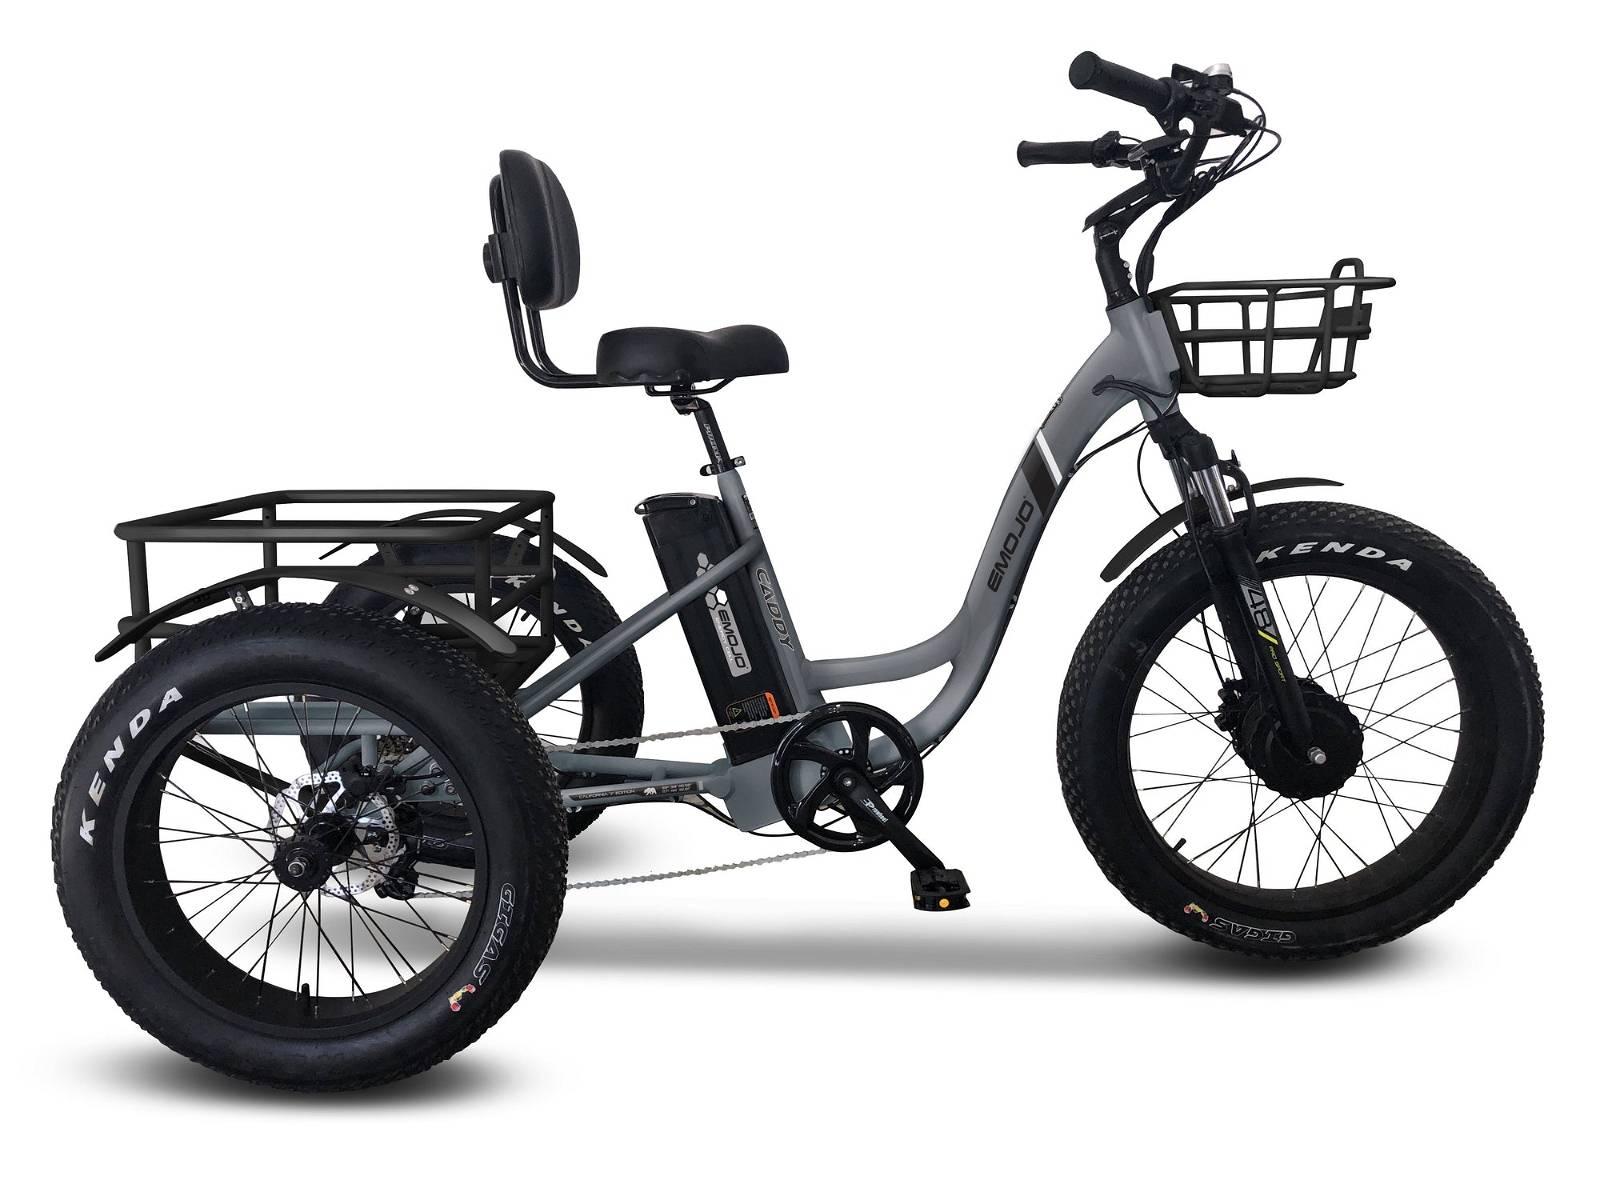 EMOJO Caddy PRO Fat Tire Trike